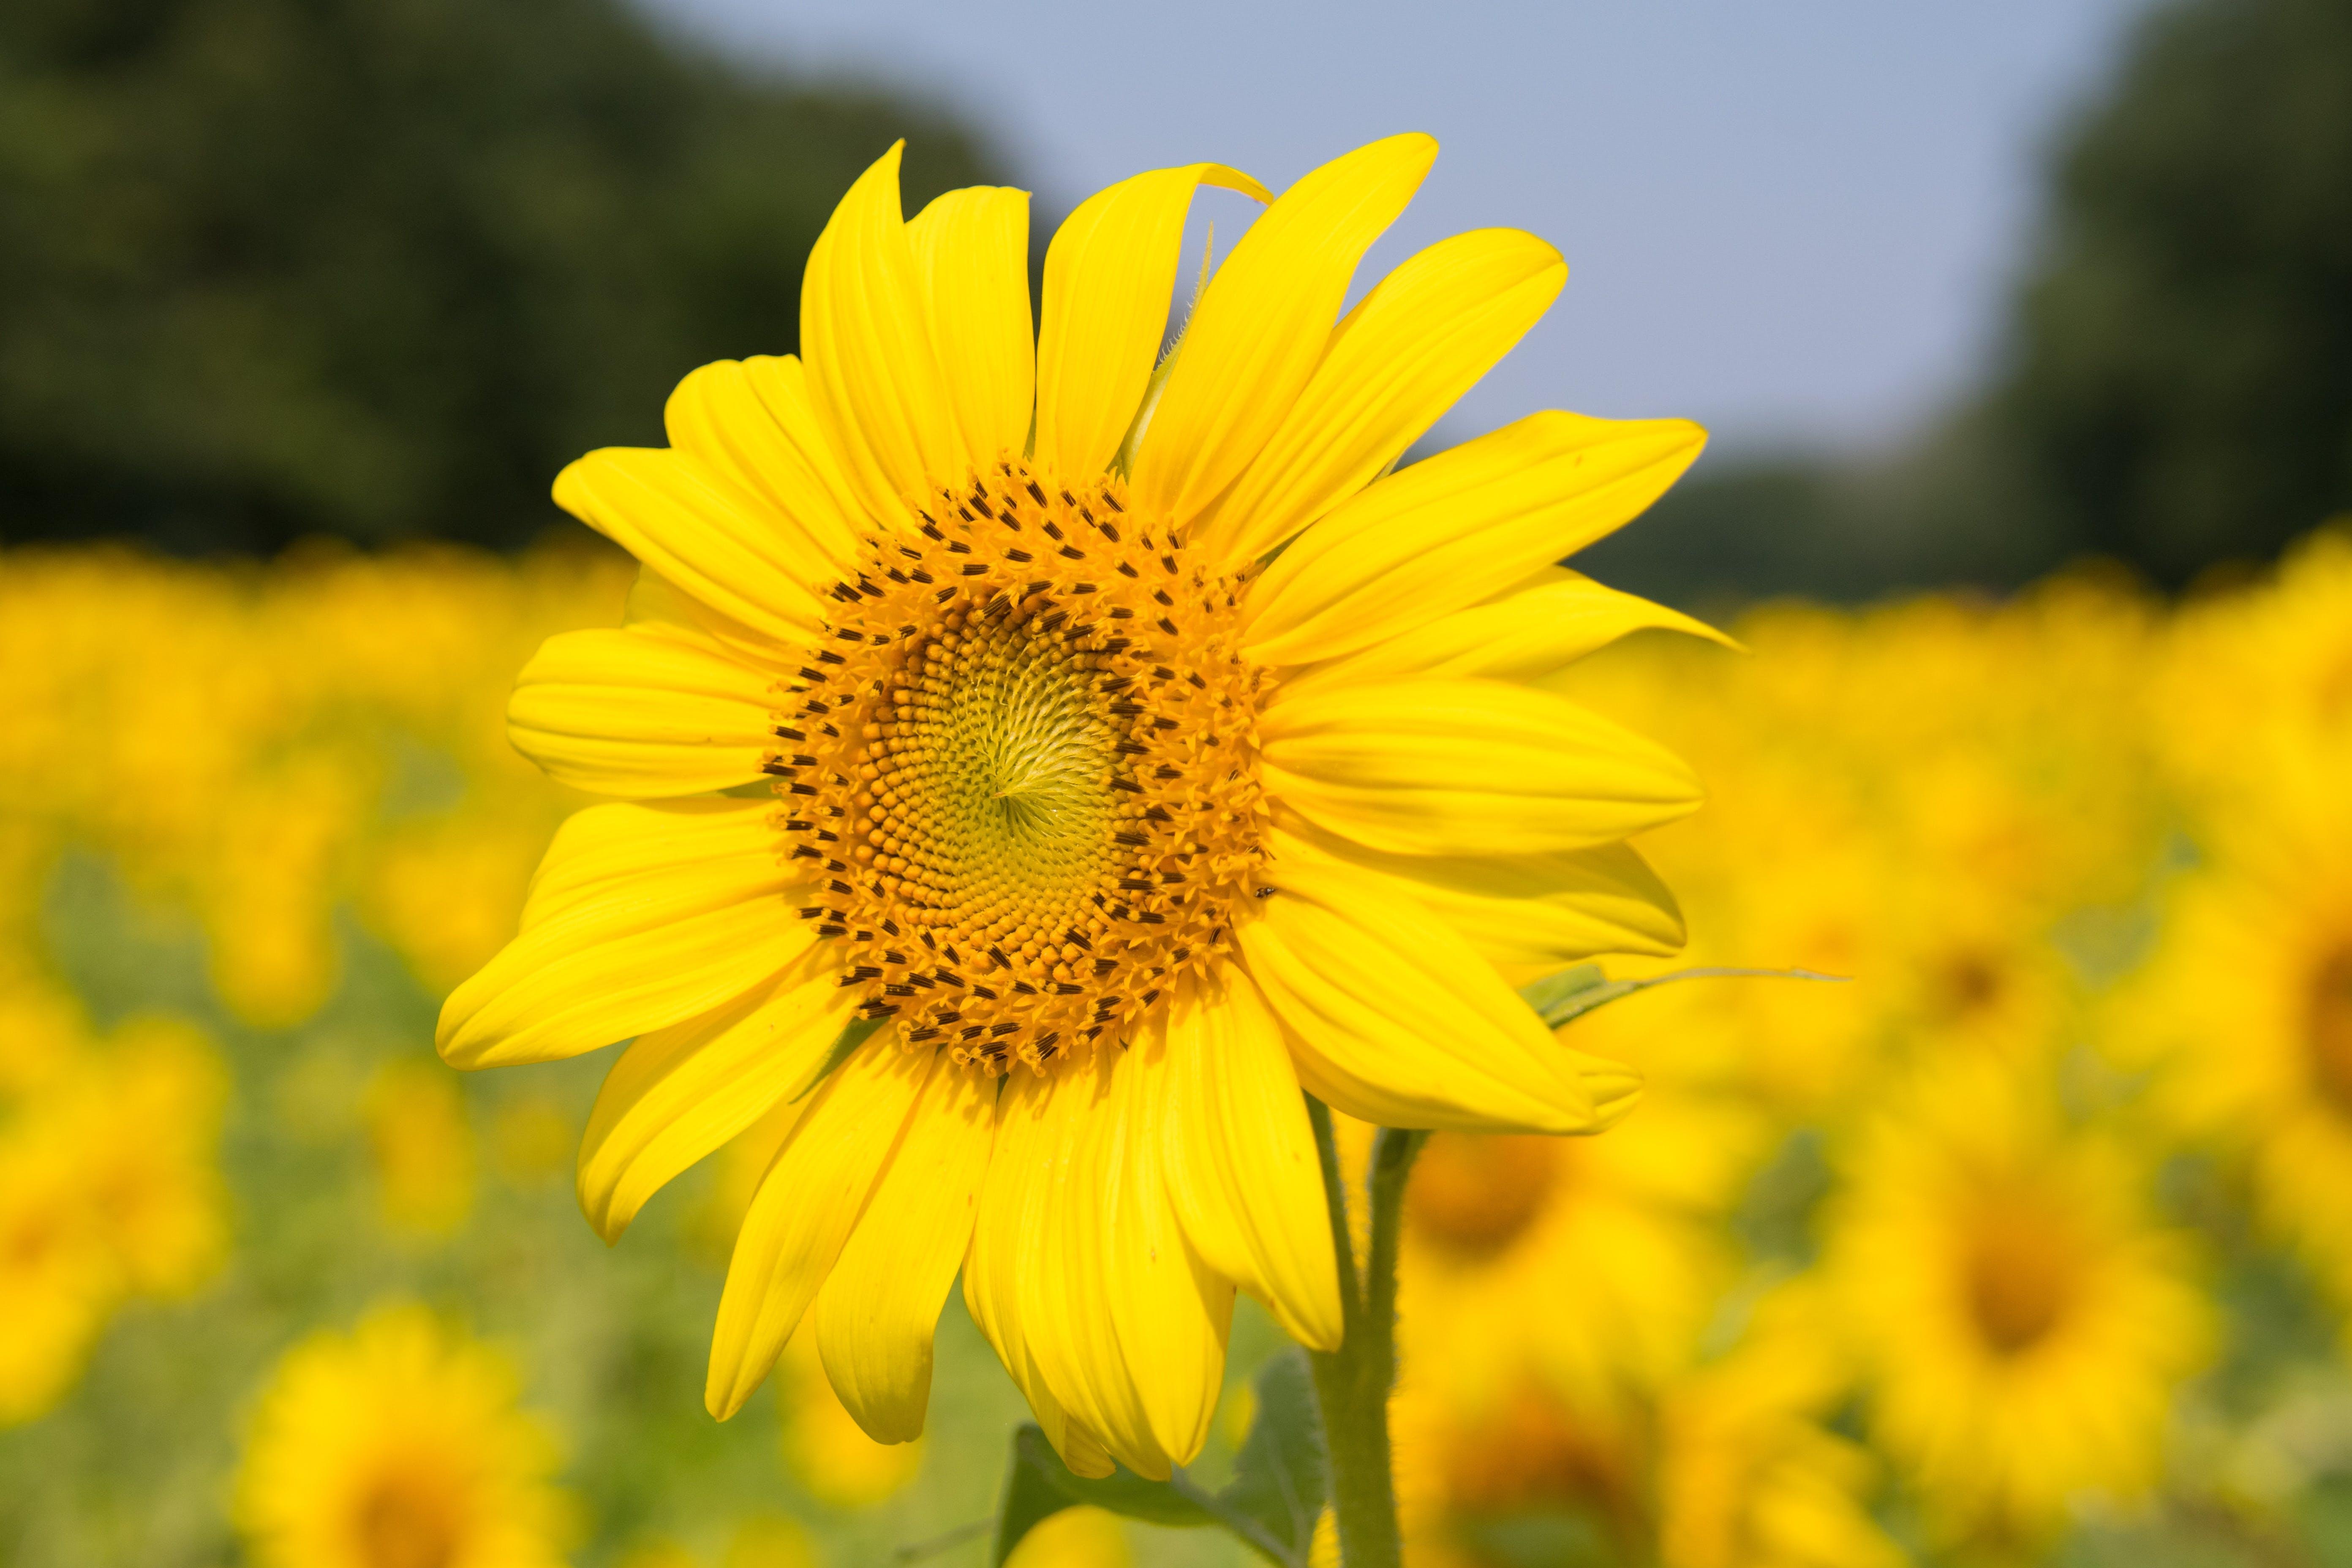 Sunflower Plant